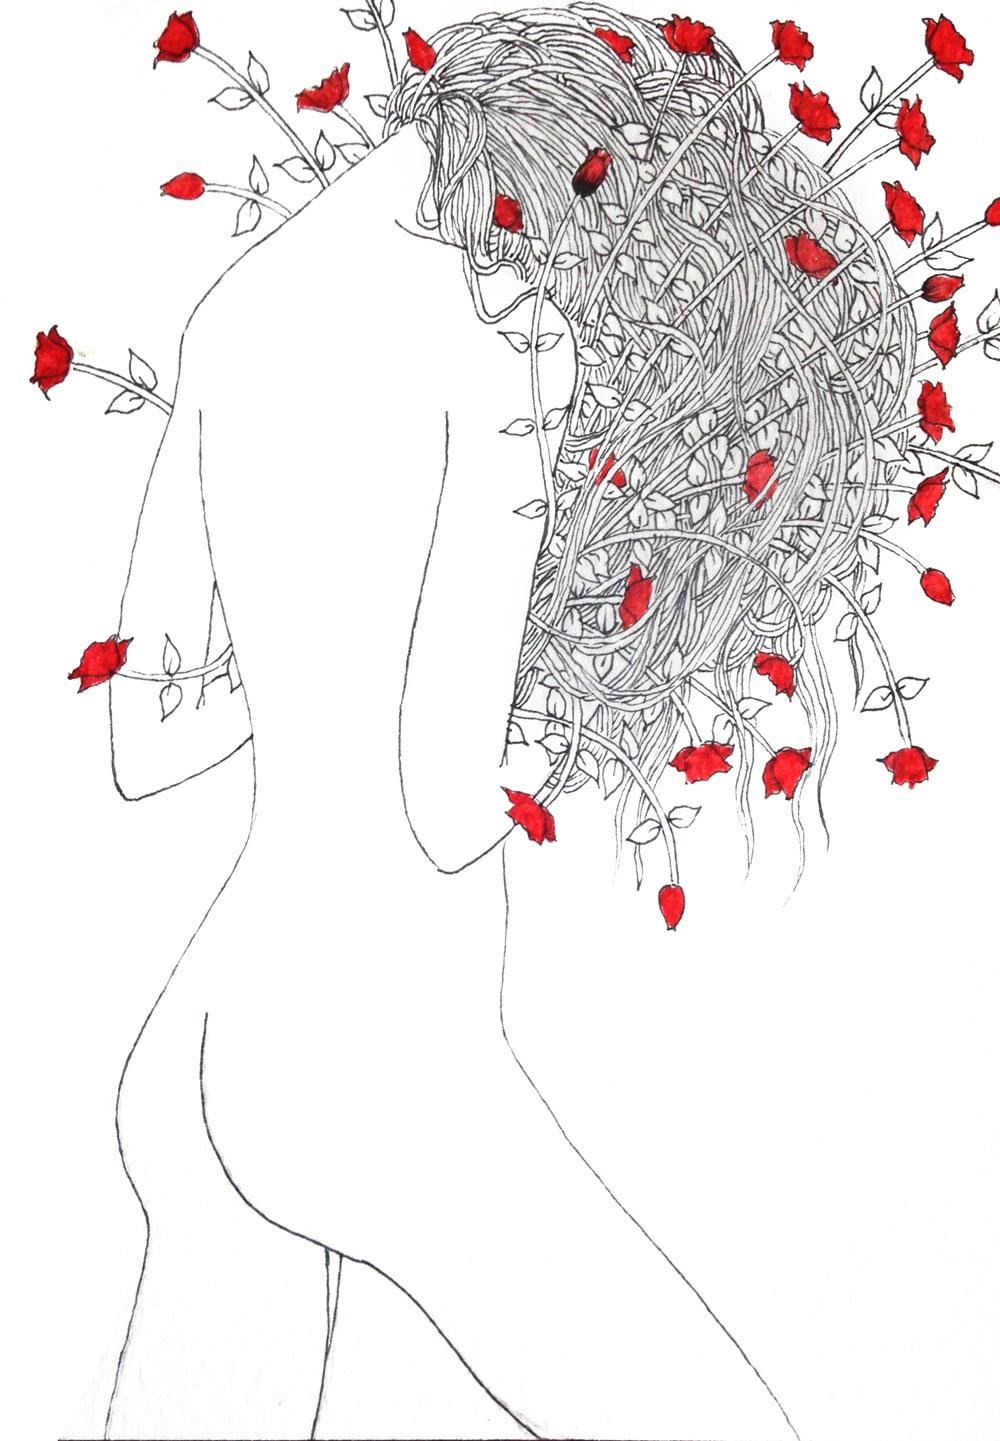 #linework #Hand made postcards #drawing #conceptualdrawing #blackandwhite #myhomegallery #minisizeart #oneofakind #affordableart #graphicart #noumedacarbone #italianartist #italianart #femaleartist #woman #figurative #surrealart #surrealism #details #ink #pigmentliner #markers #frenchtouch #illustration #dreamlike #weirdart #feminine #buyart #arttobuy #artlovers #artshop #artgallery #artcollection #